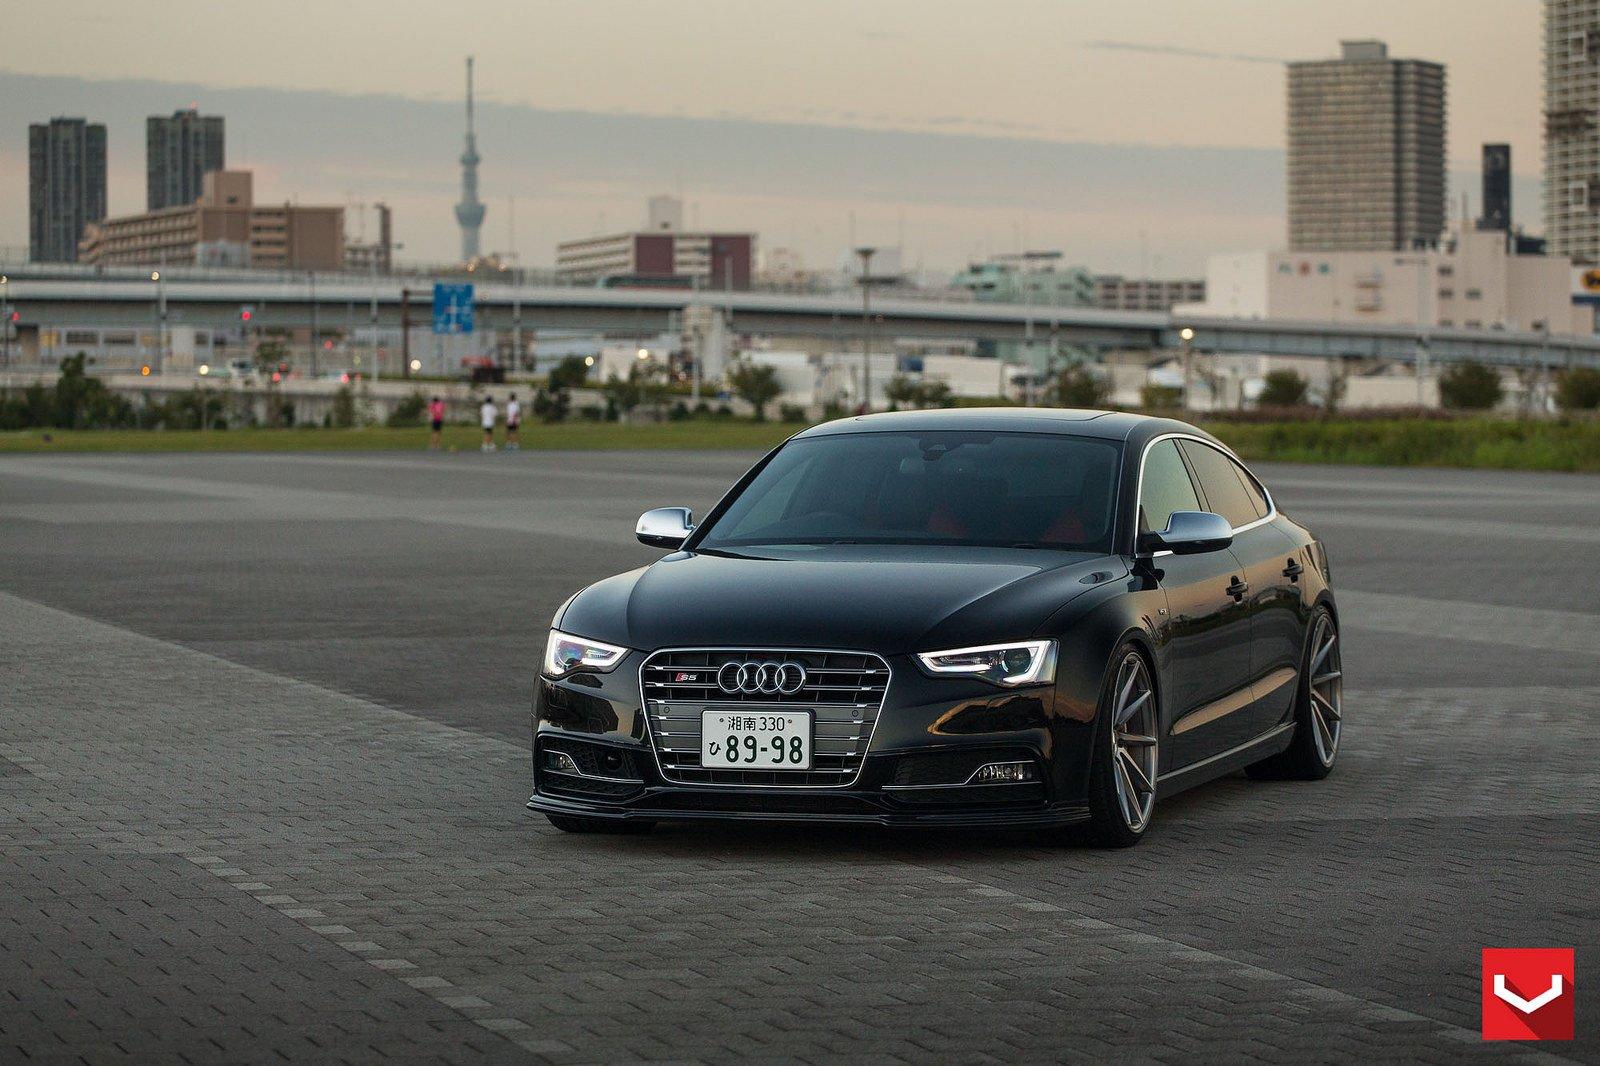 Audi S5 Tuning Audi Black Aggressive Luxury Sports Car | 2017 - 2018 ...